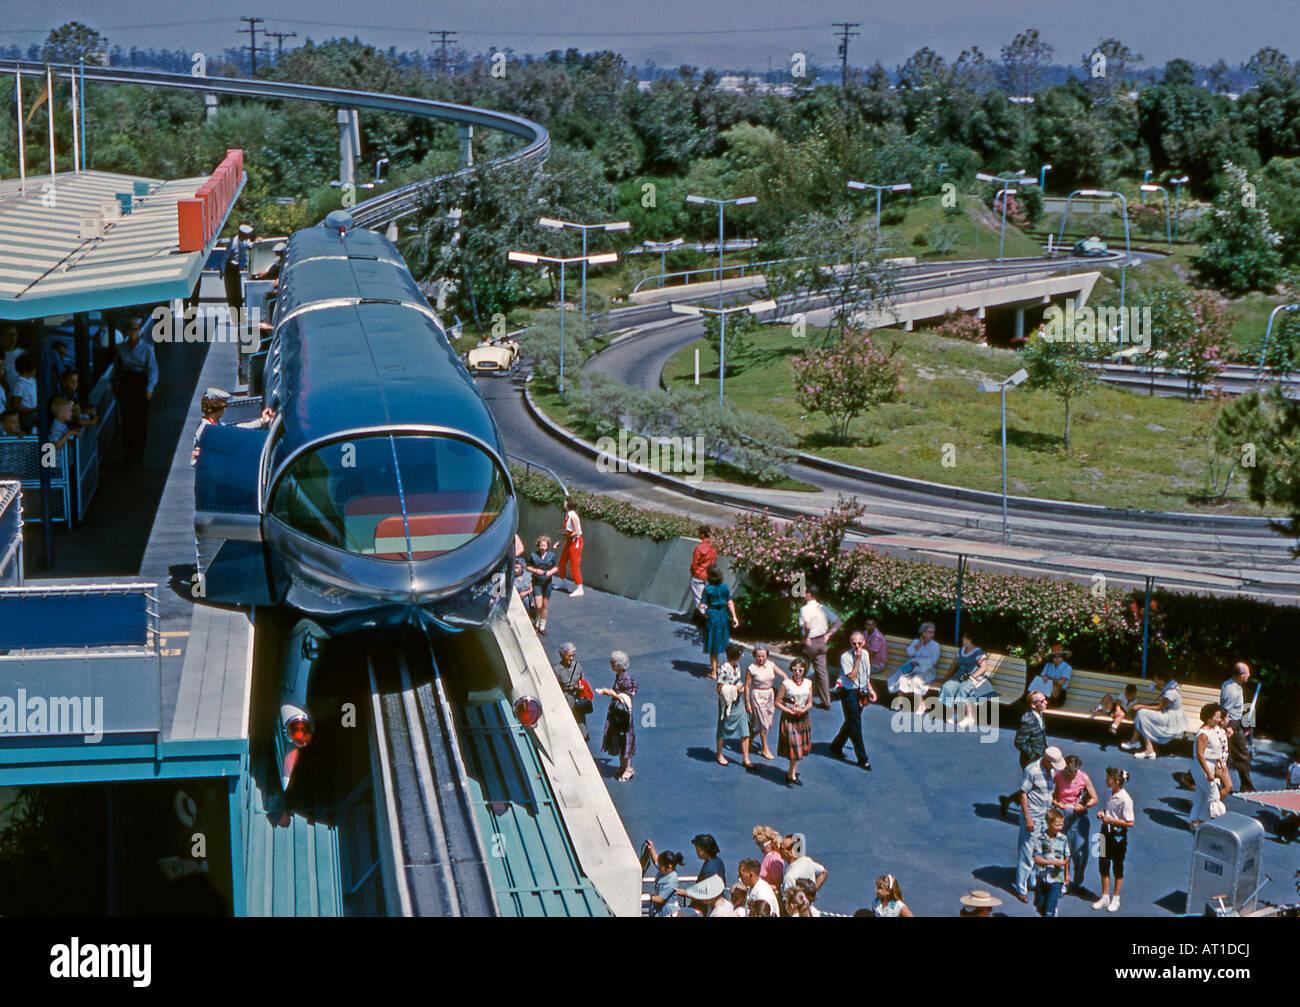 How to Ride the Disneyland (California) Monorail photo